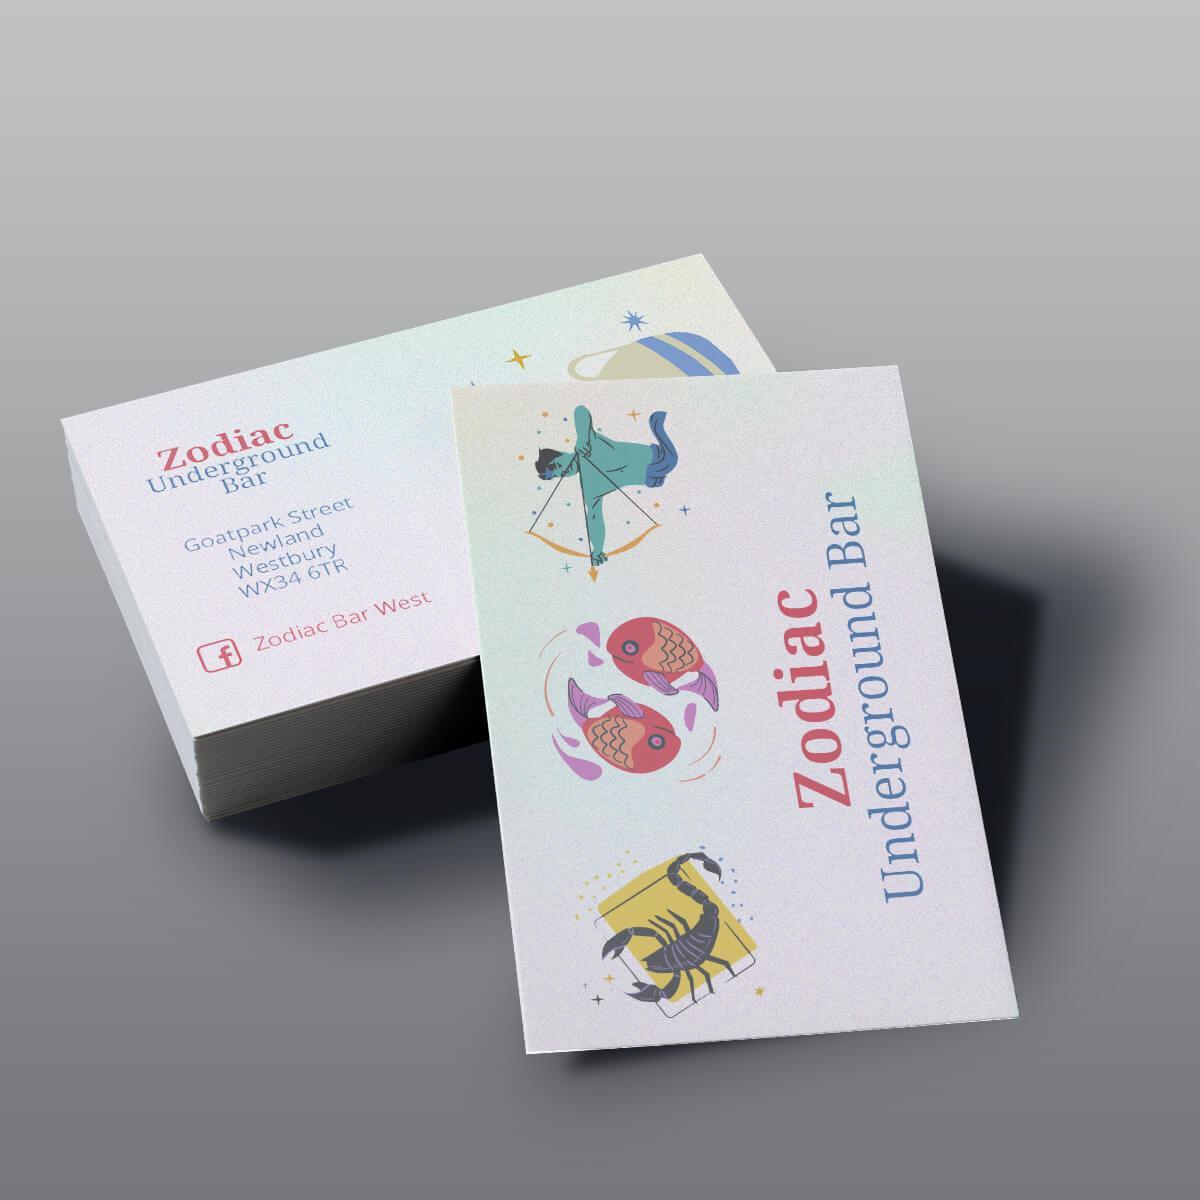 Pearl Business Cards - Zodiac Bar